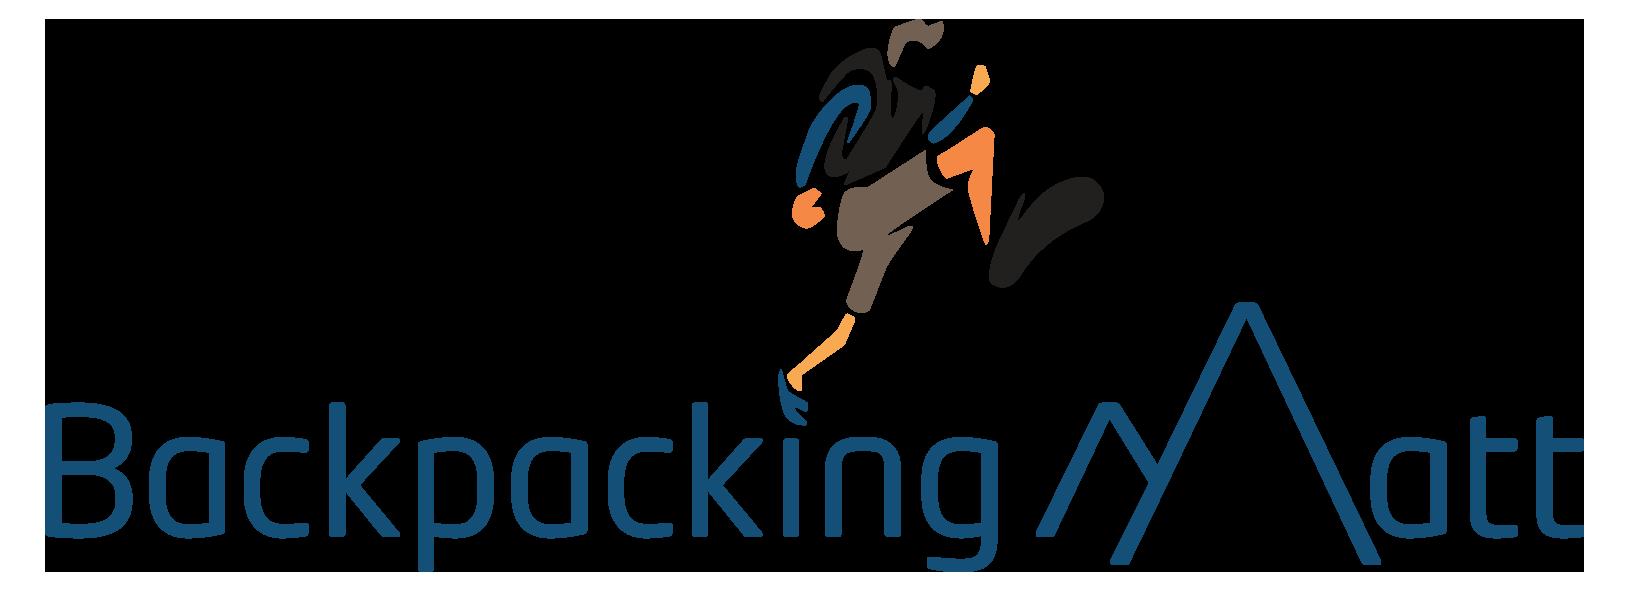 Backpackingmatt Logo